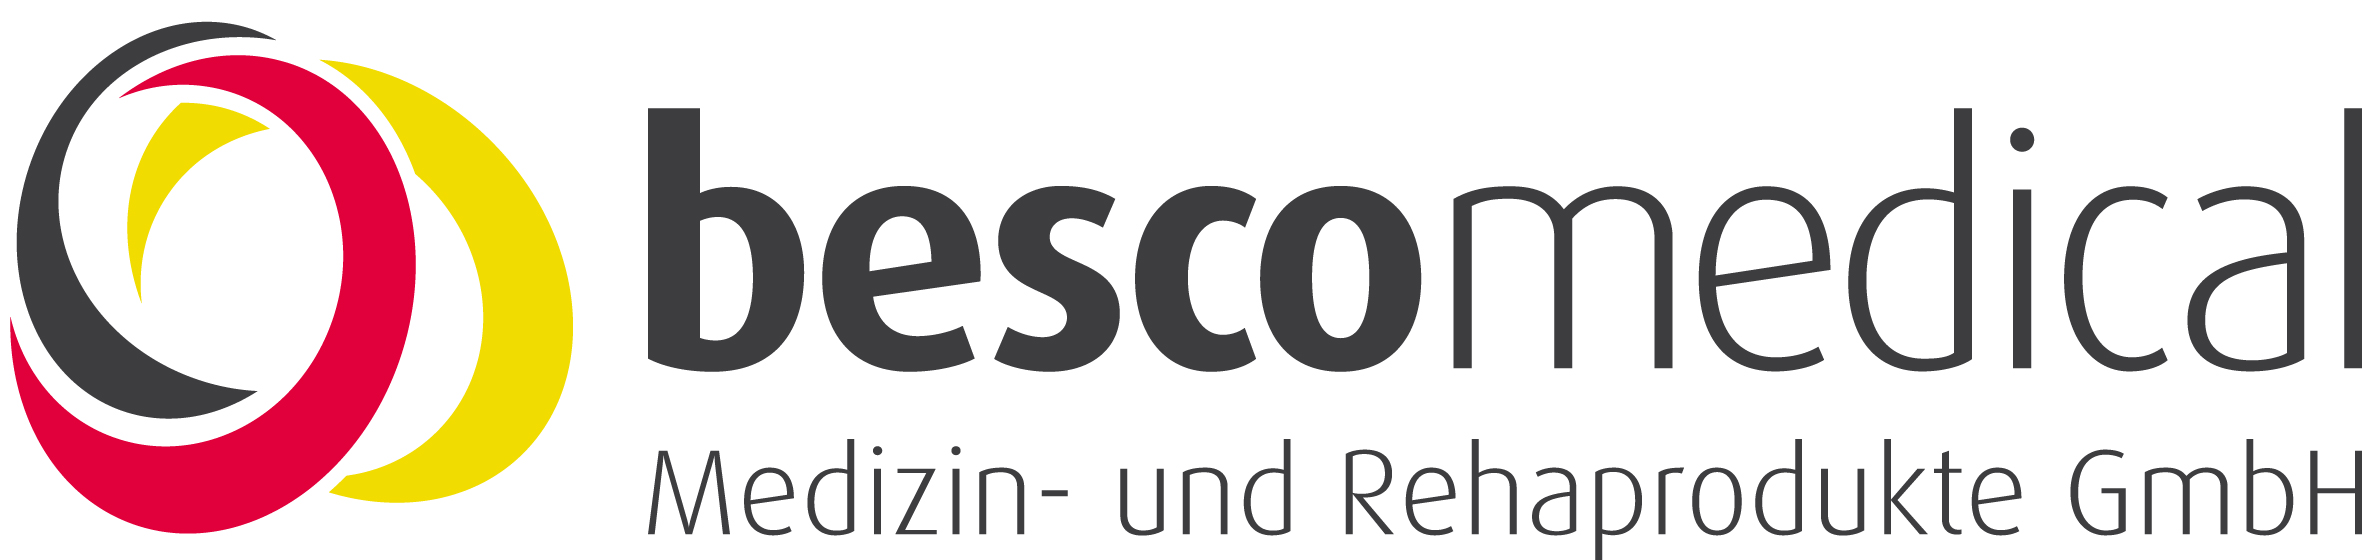 Besco Medical Medizin- und Rehaprodukte GmbH